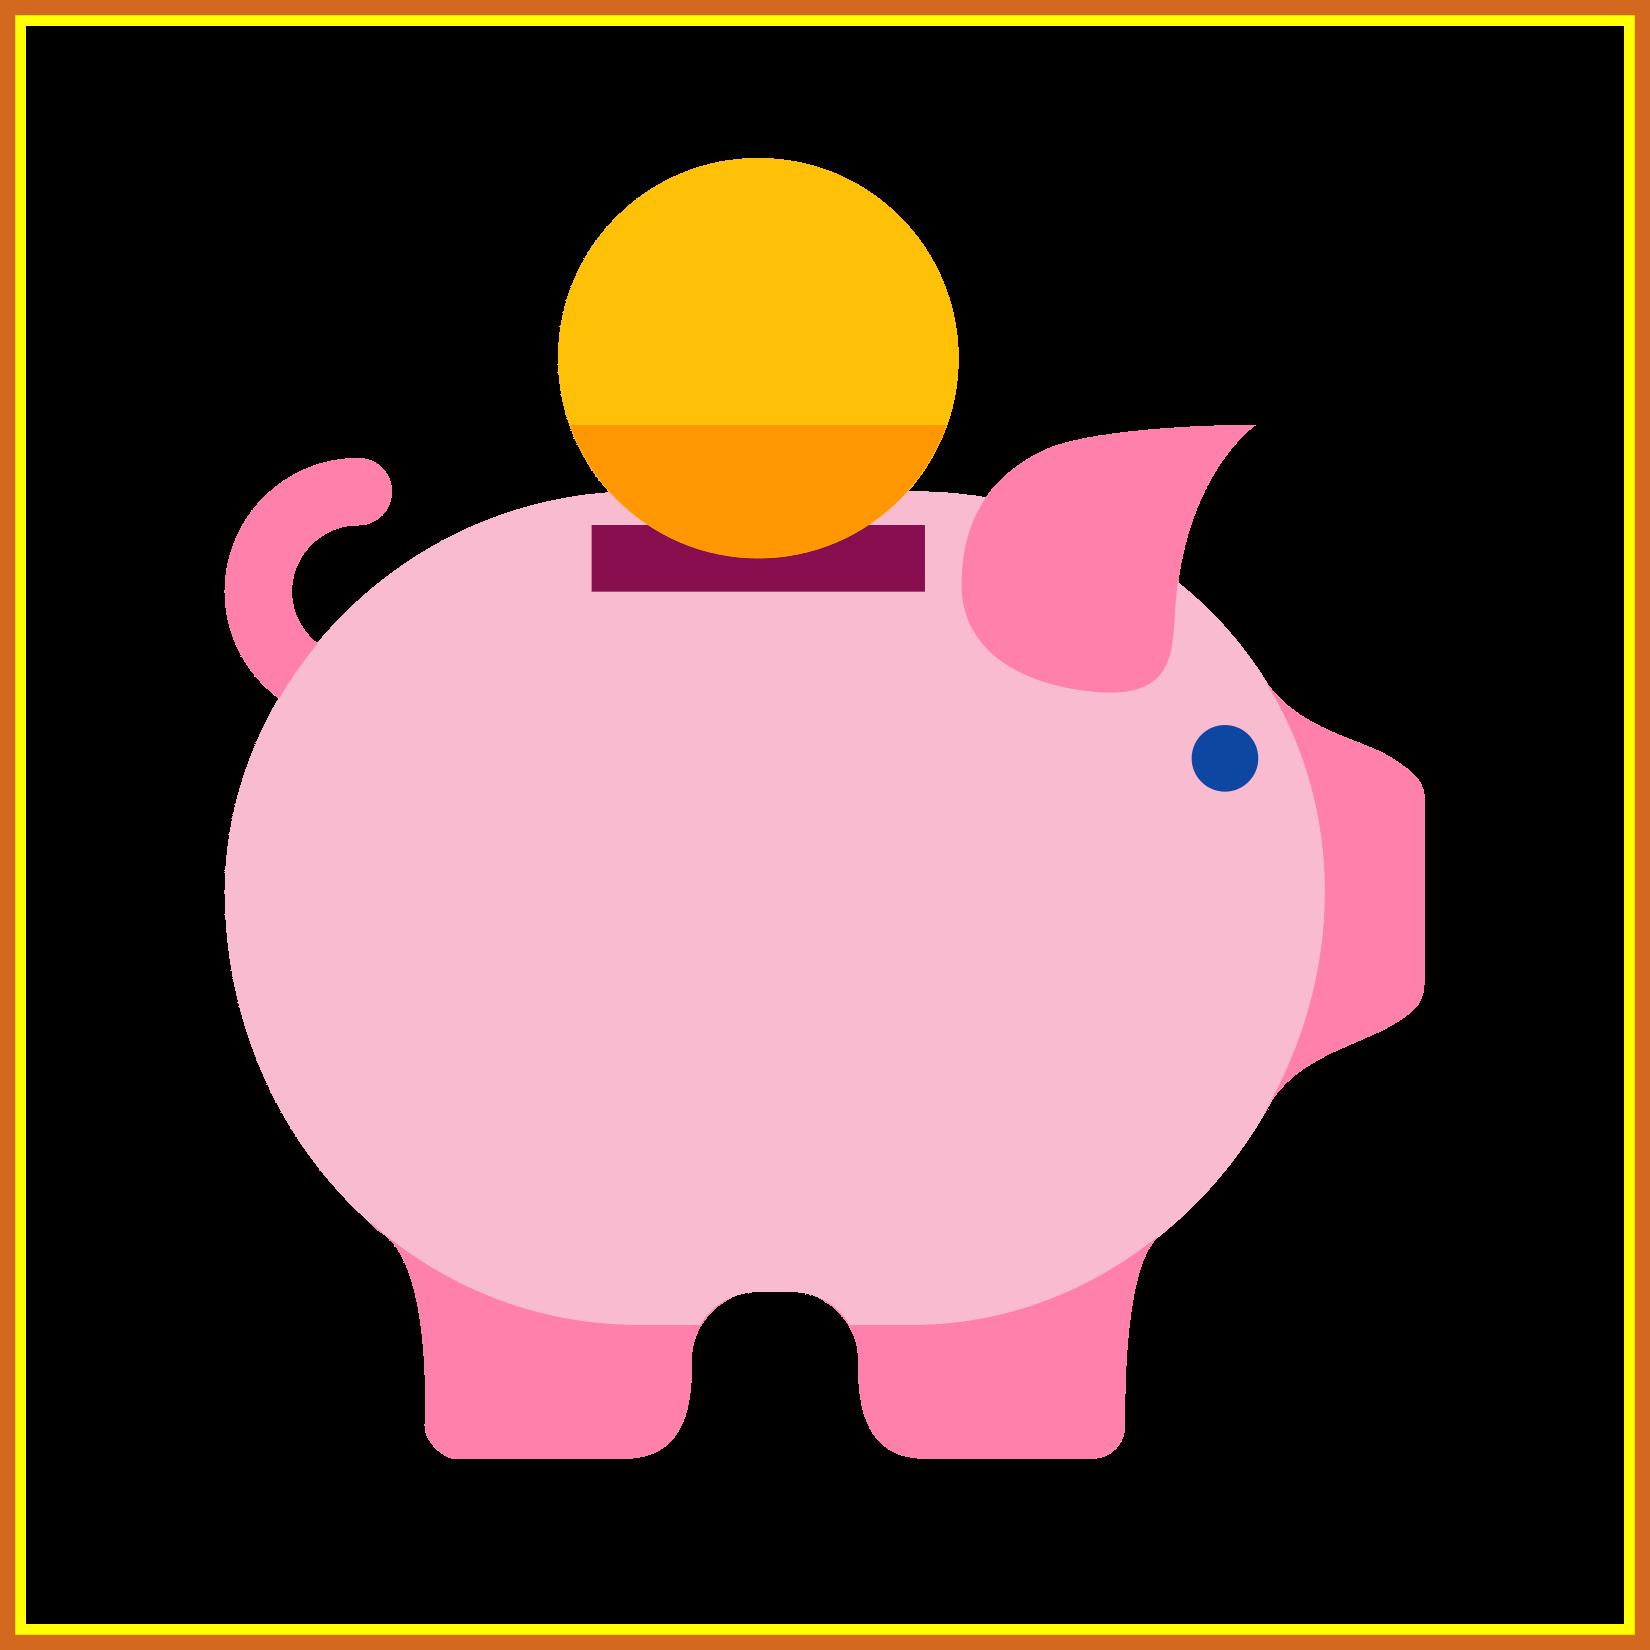 Piggy bank saving money clipart png black and white stock Unbelievable Piggybank Money Clipart Explore For Piggy Bank D Trends ... png black and white stock